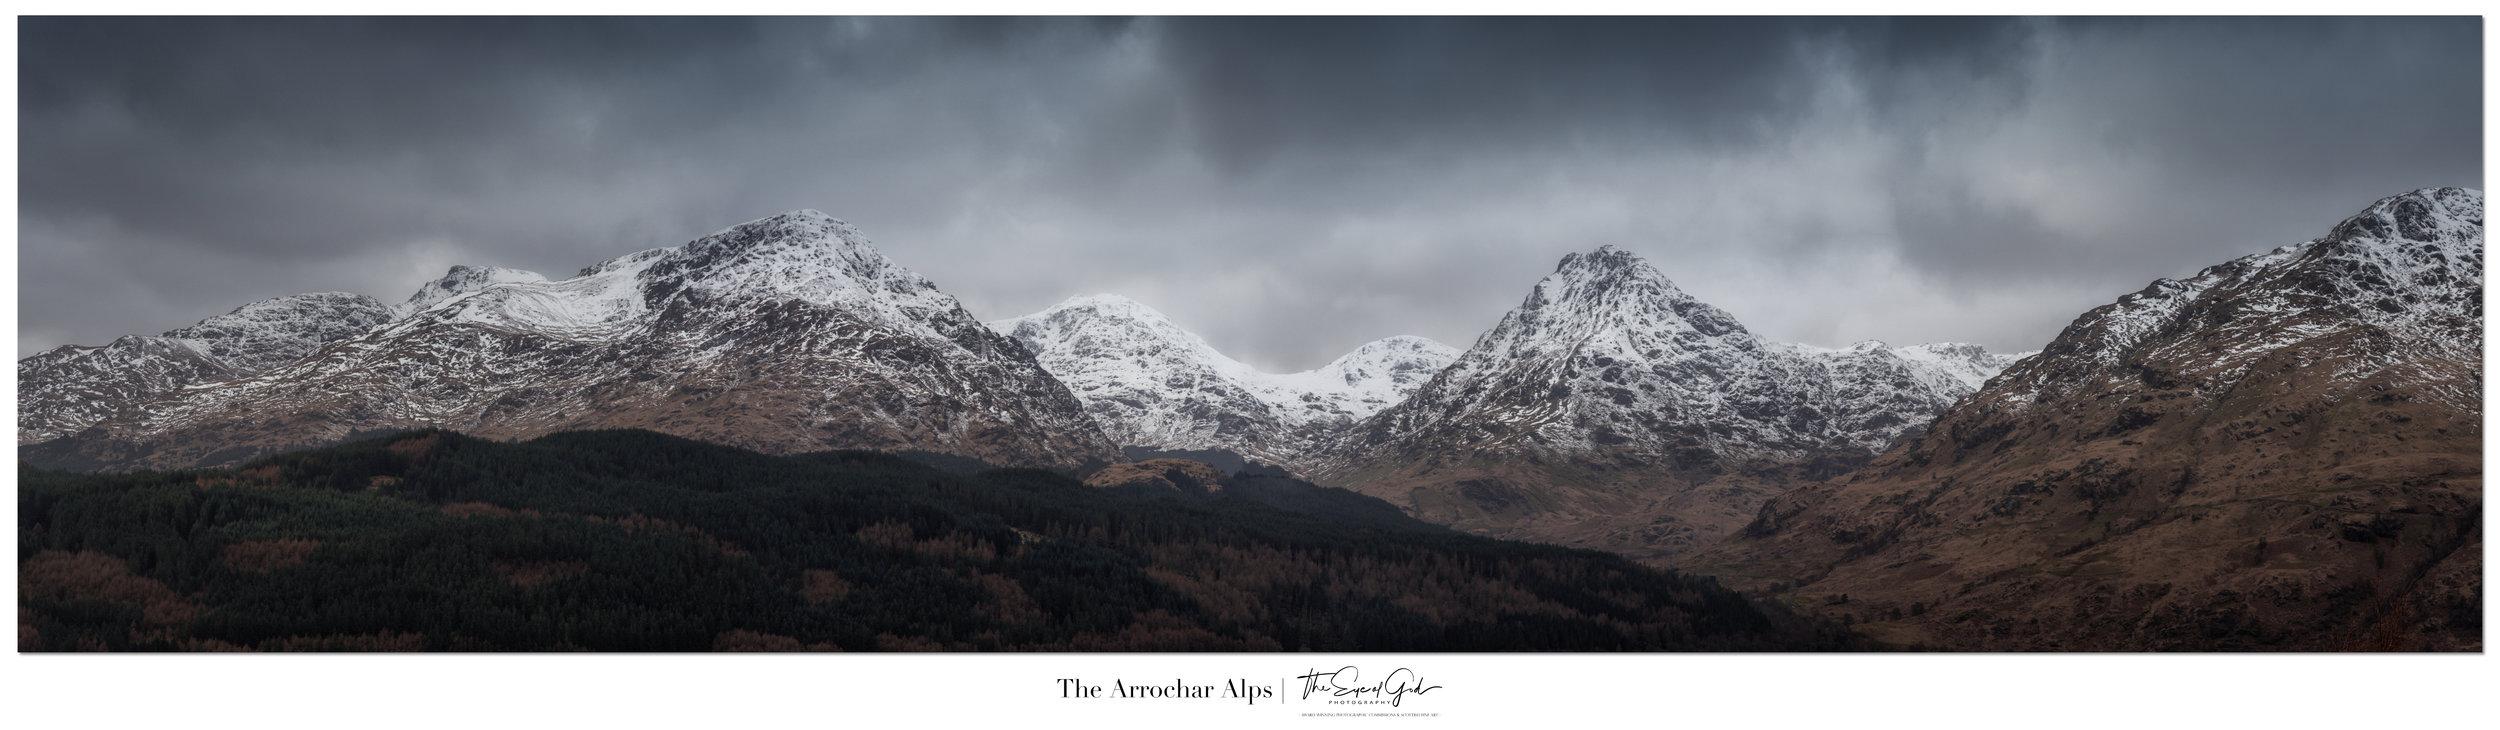 Arrochar_Alps_from_Inversnaid_Rob_Roy_Viewpoint_Scott_Wanstall